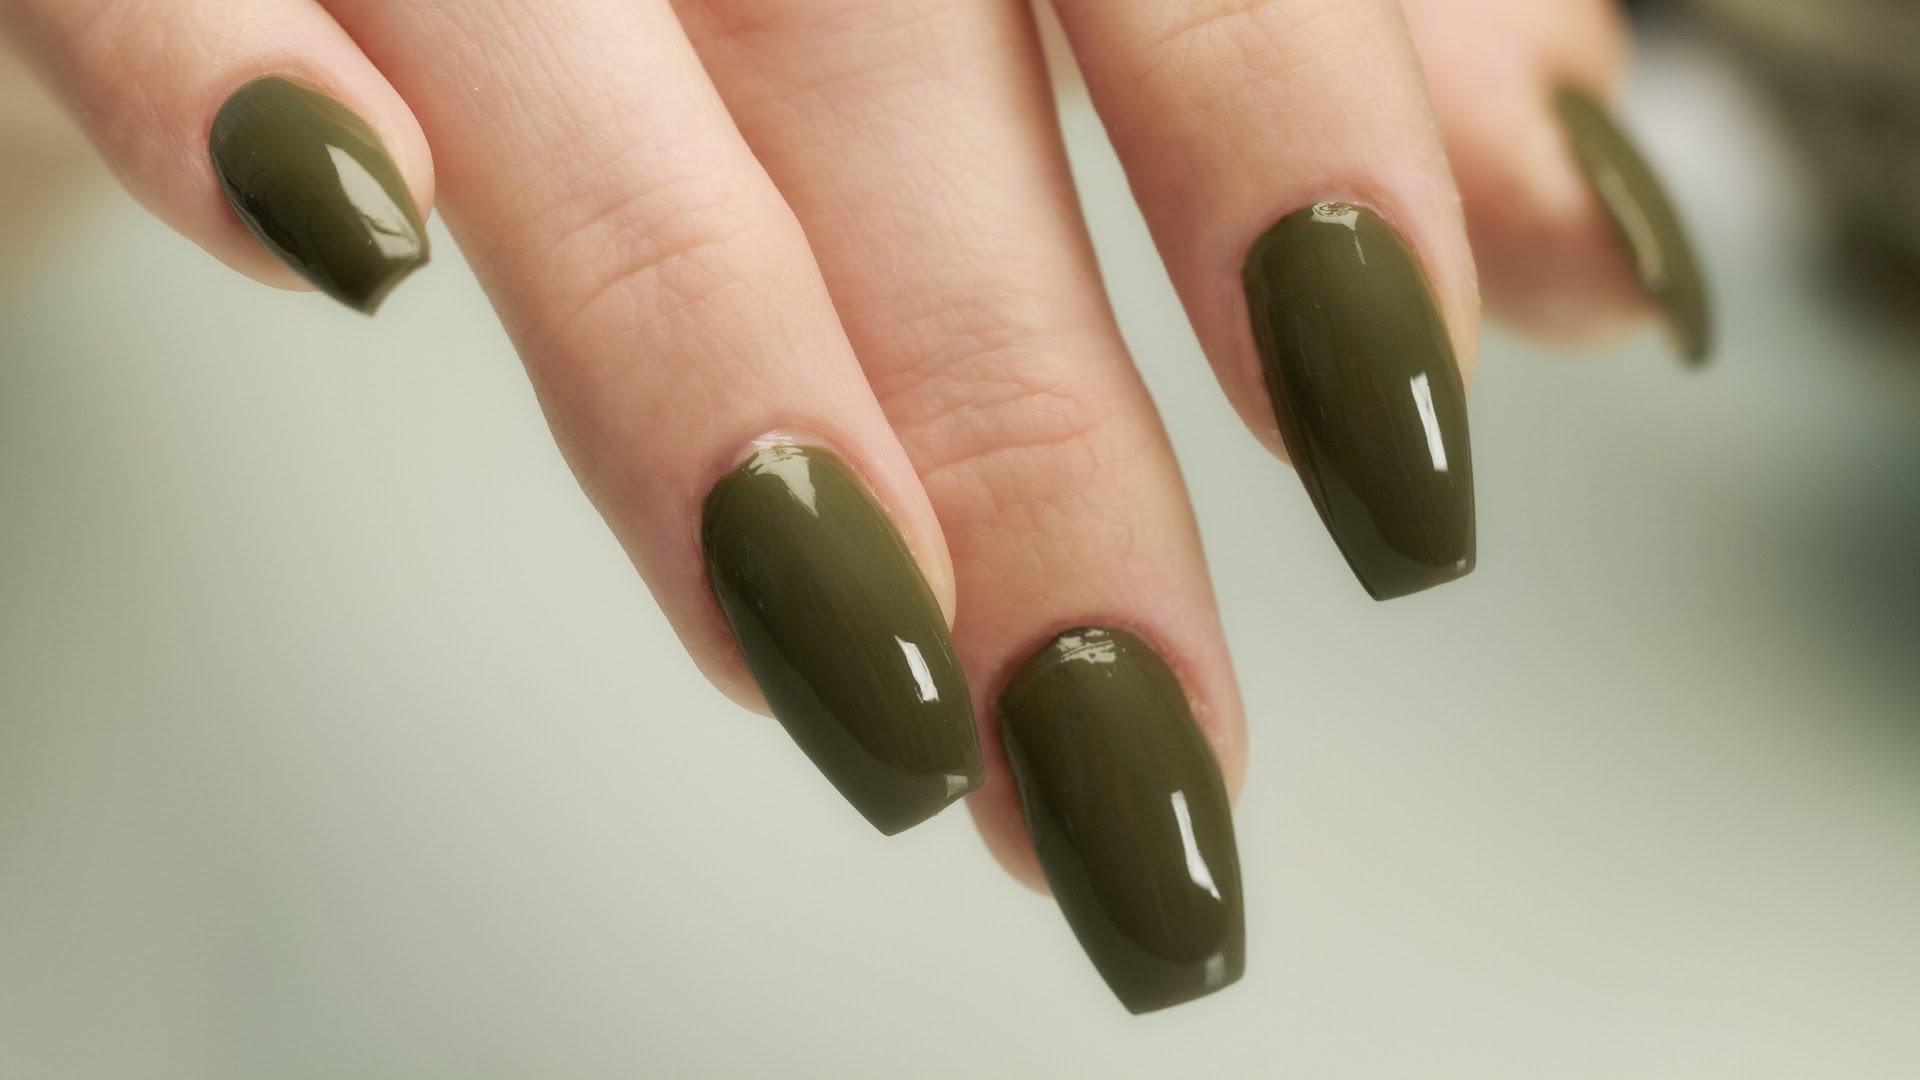 Coffin vs ballerina nails - New Expression Nails